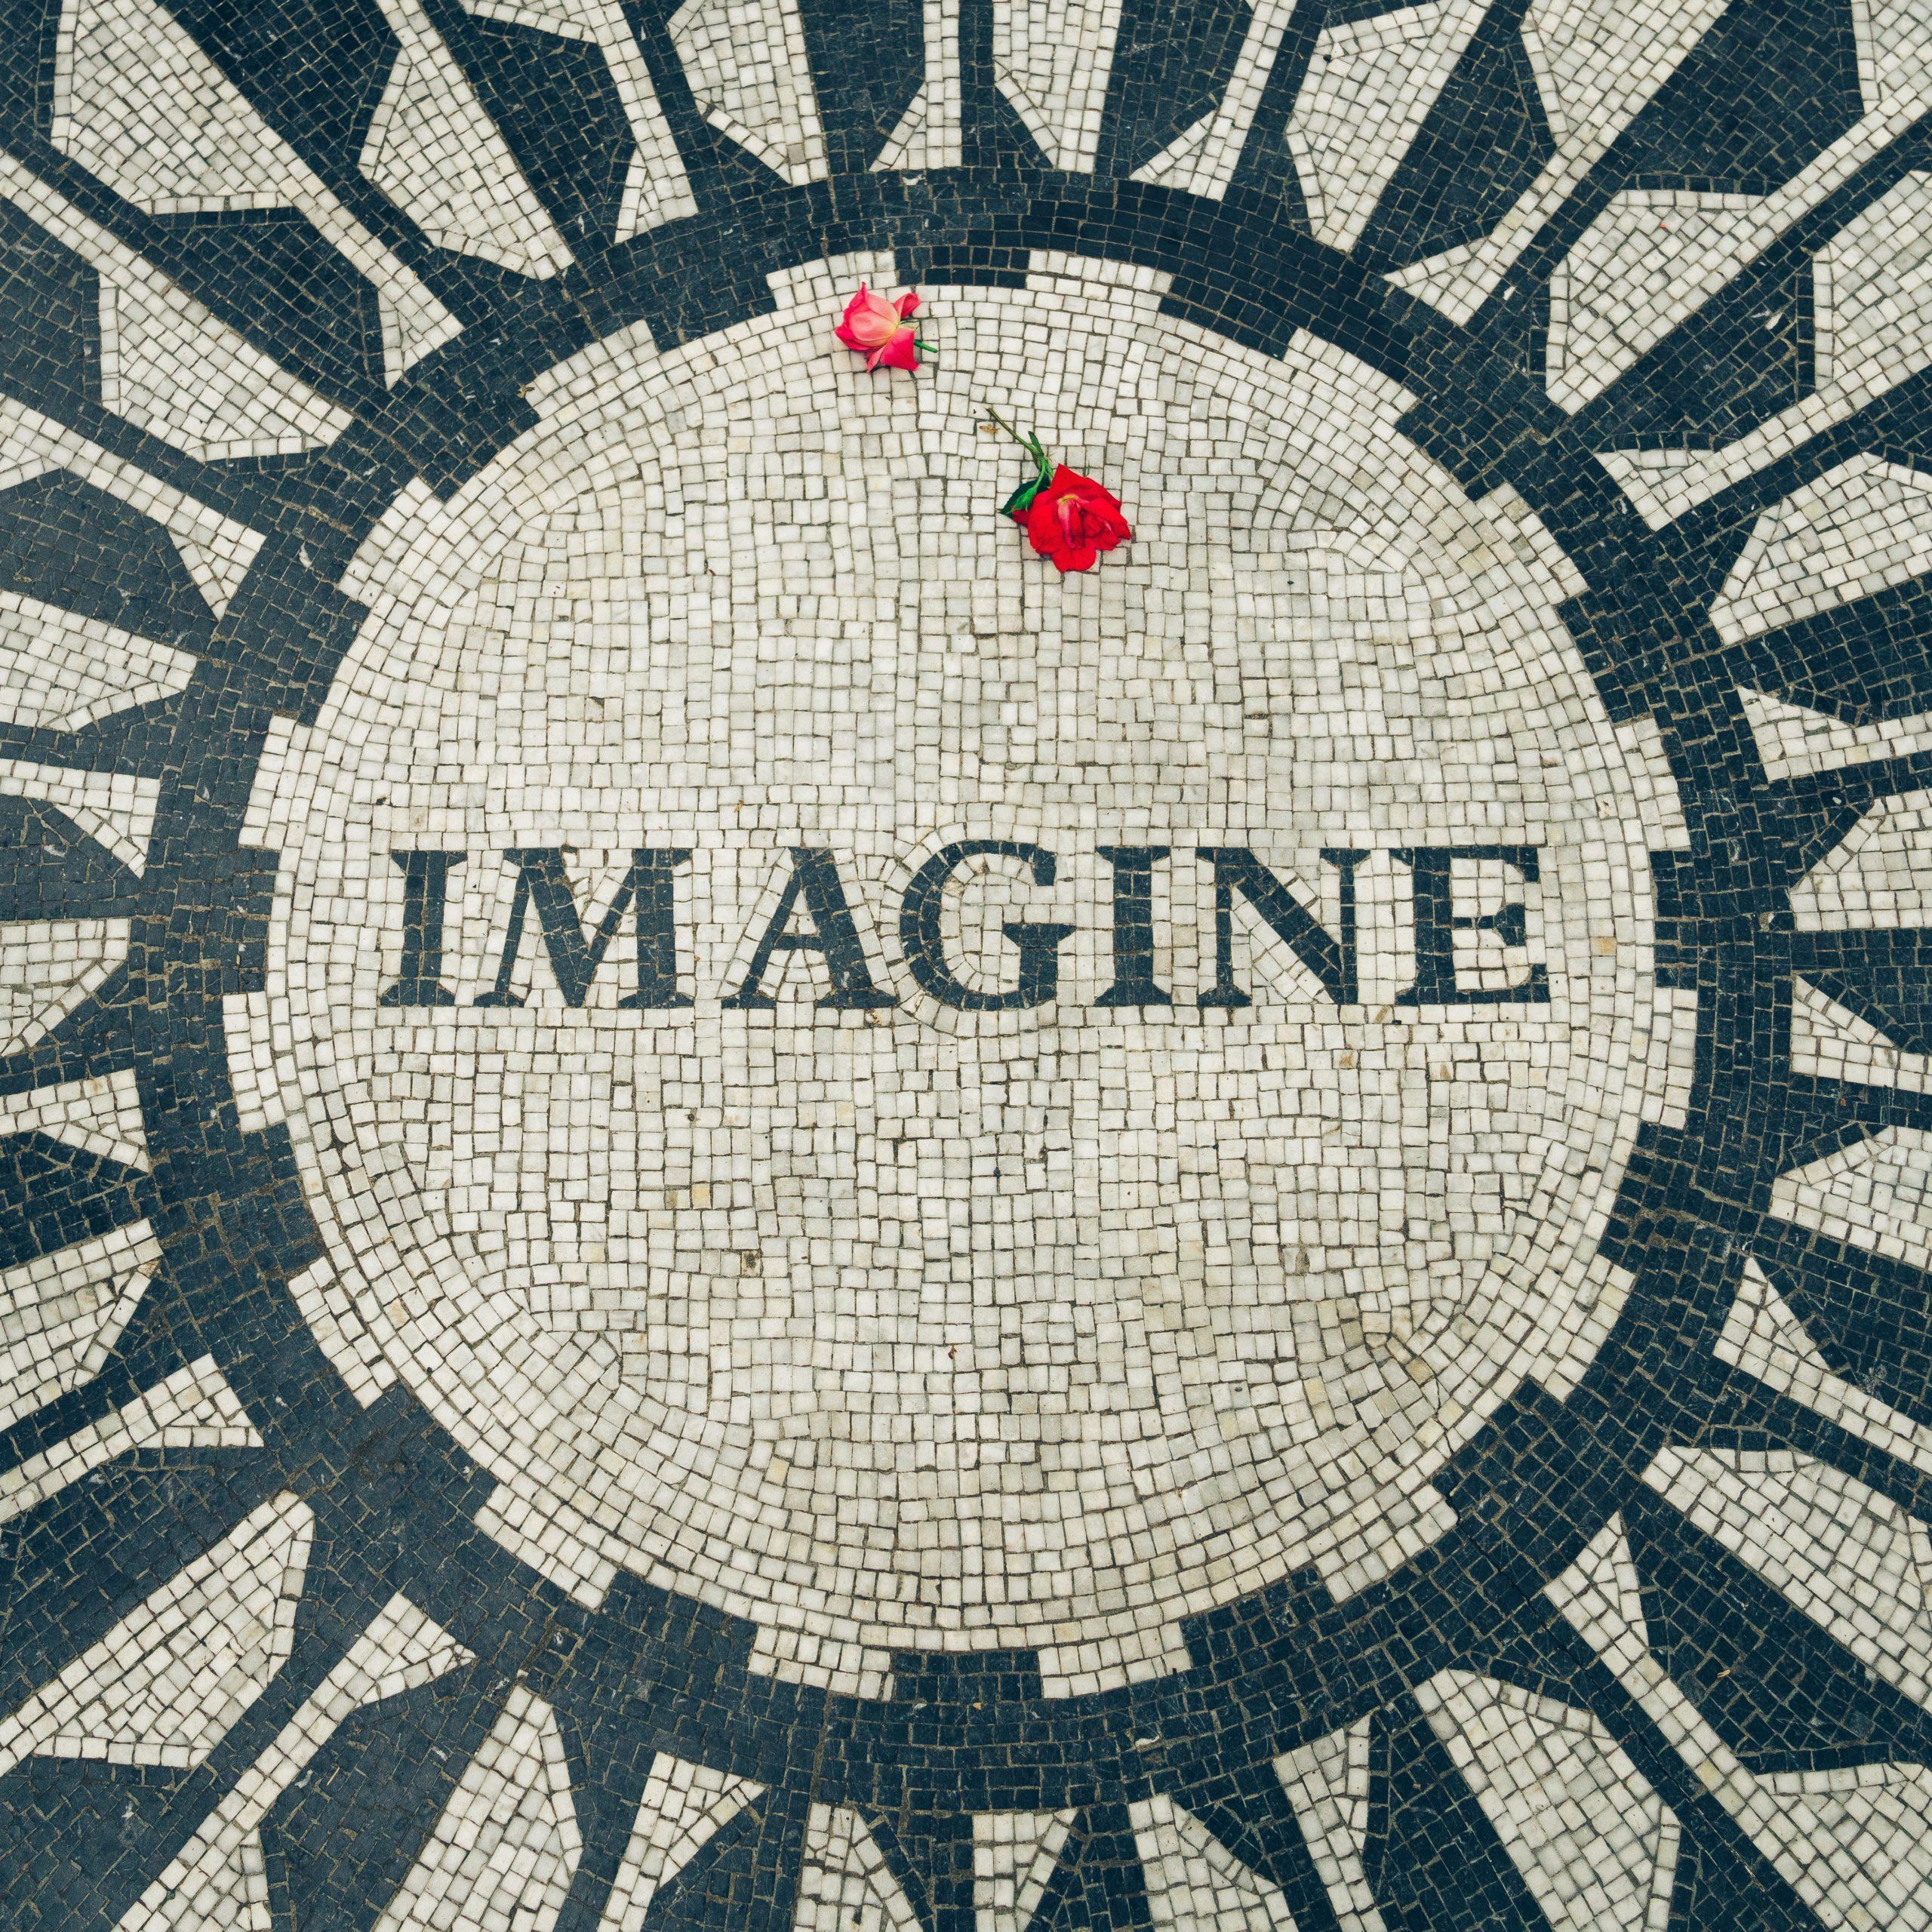 Imagine | www.rabatt-coupon.com